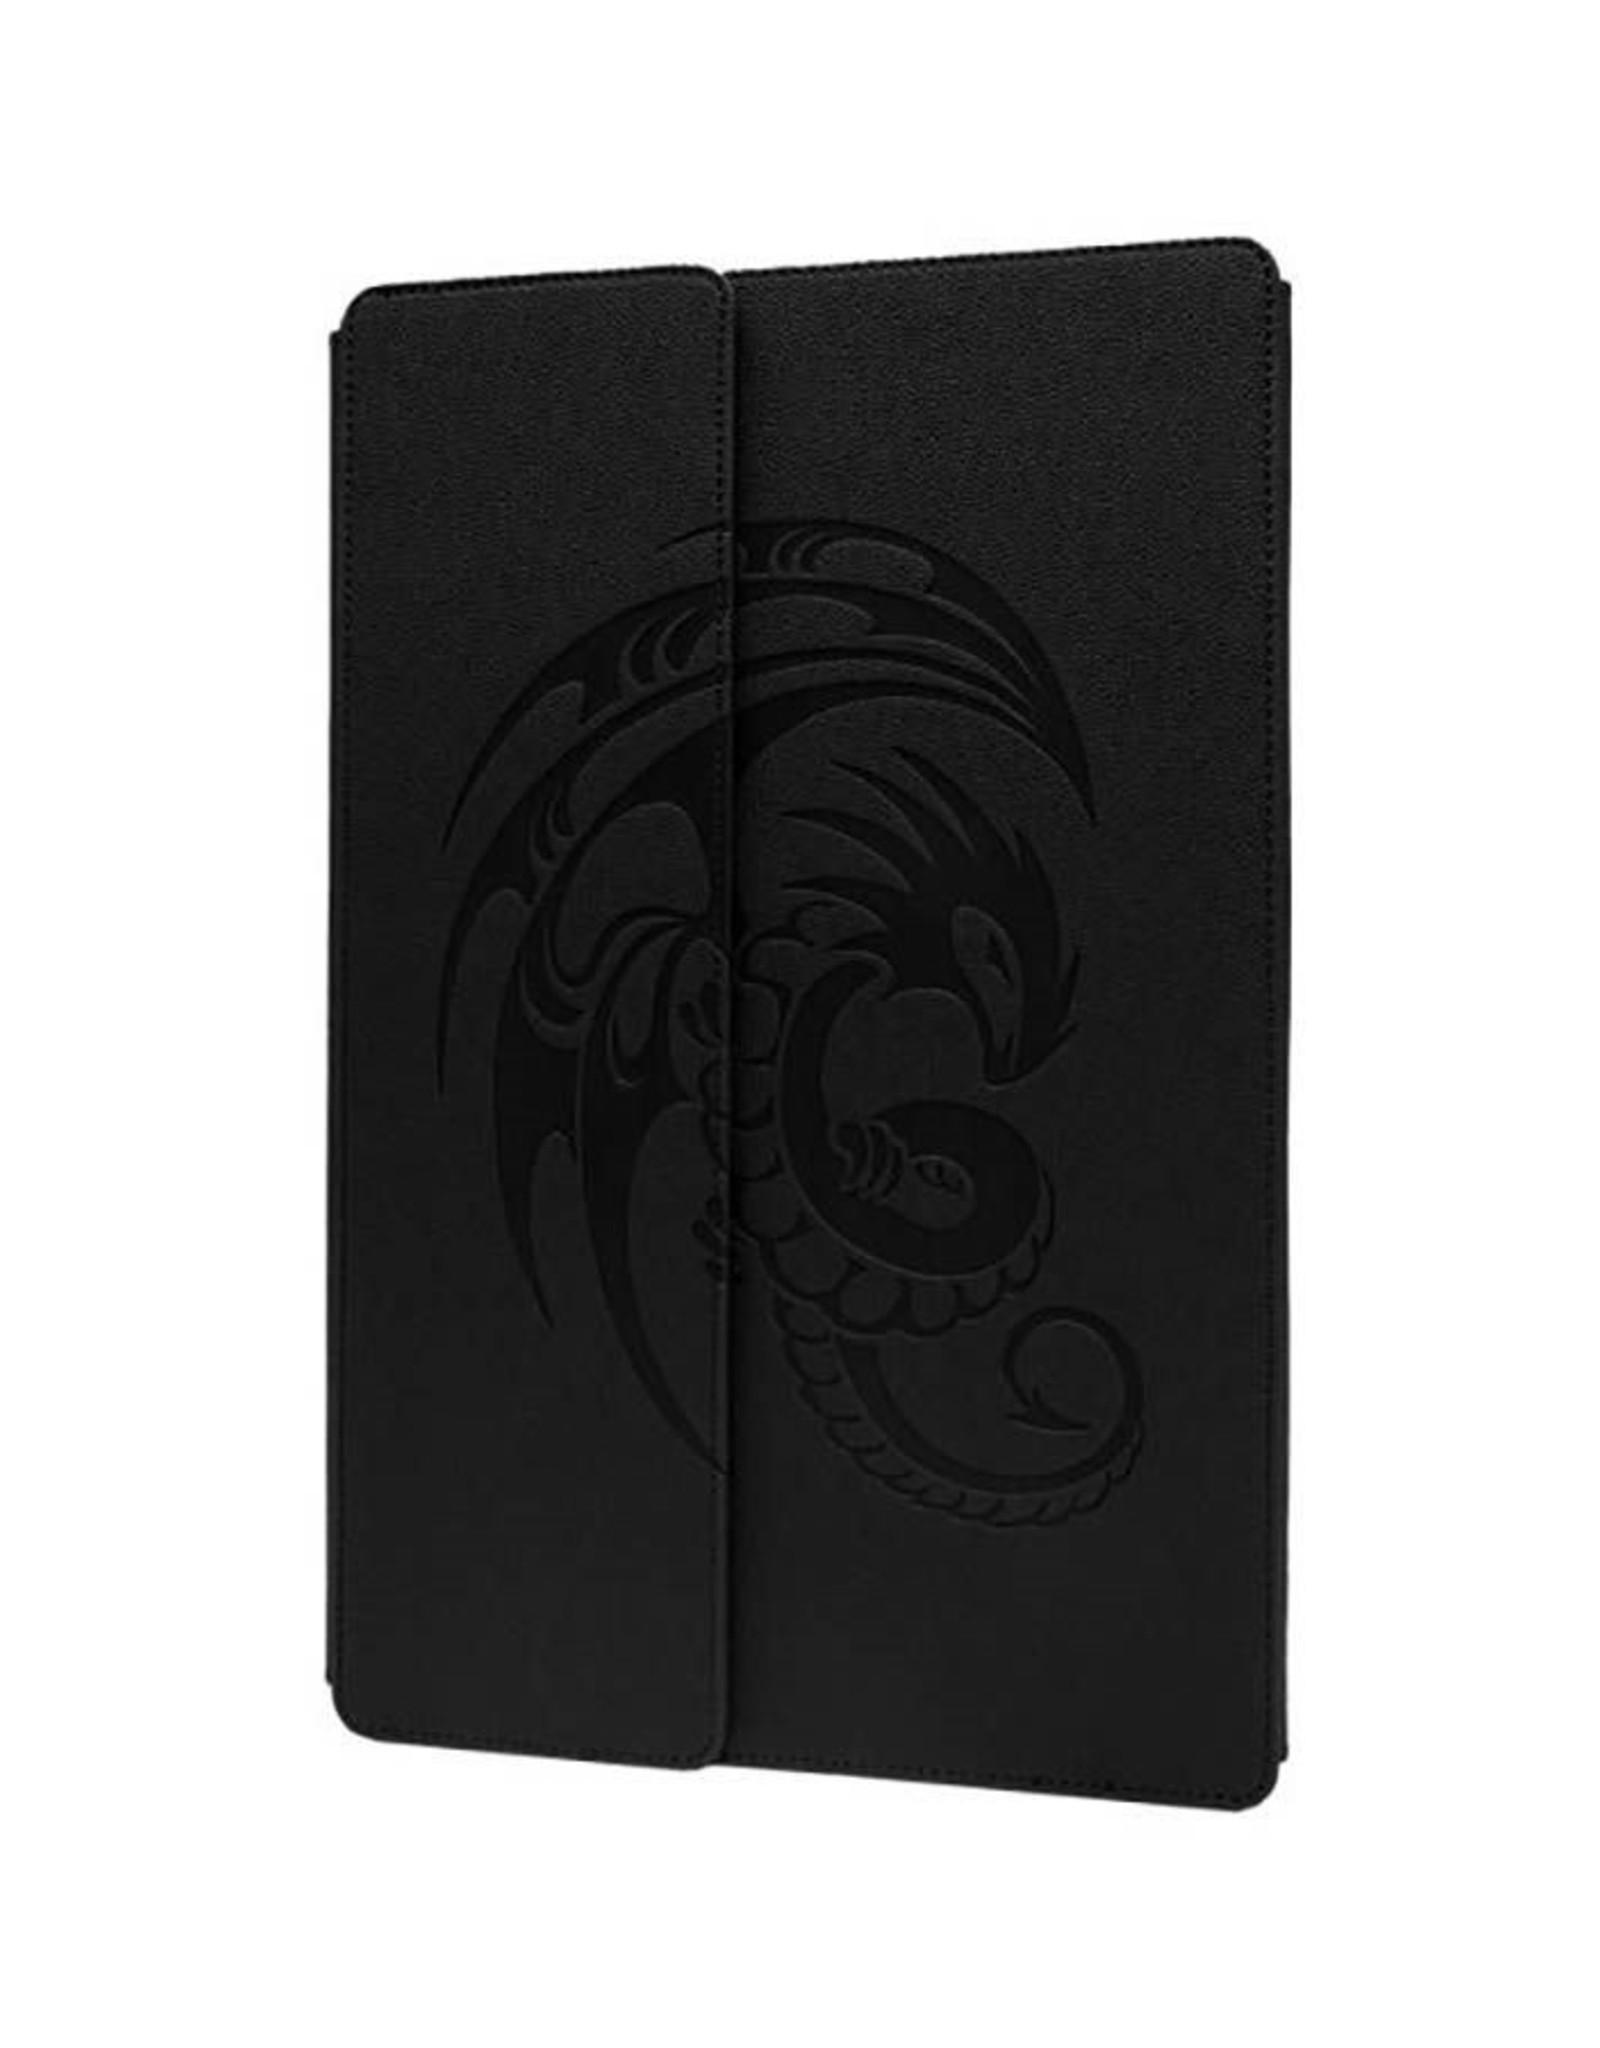 Arcane Tinmen Dragon Shield Nomad Playmat Black And Black